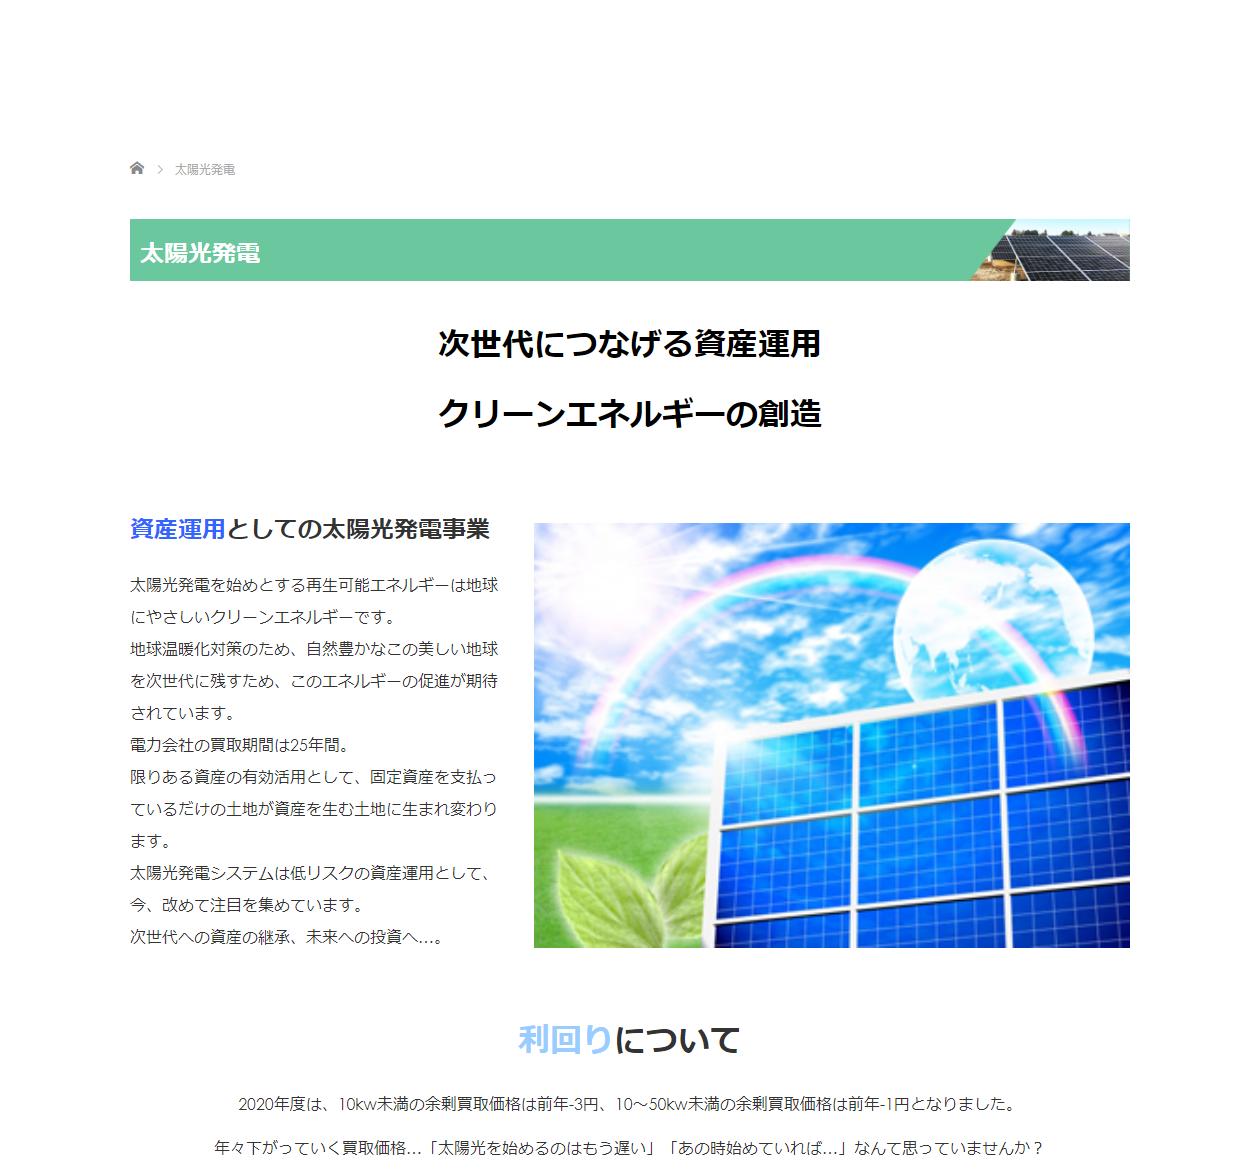 "<span class=""title"">エコ・ロハスジャパン株式会社の口コミや評判</span>"